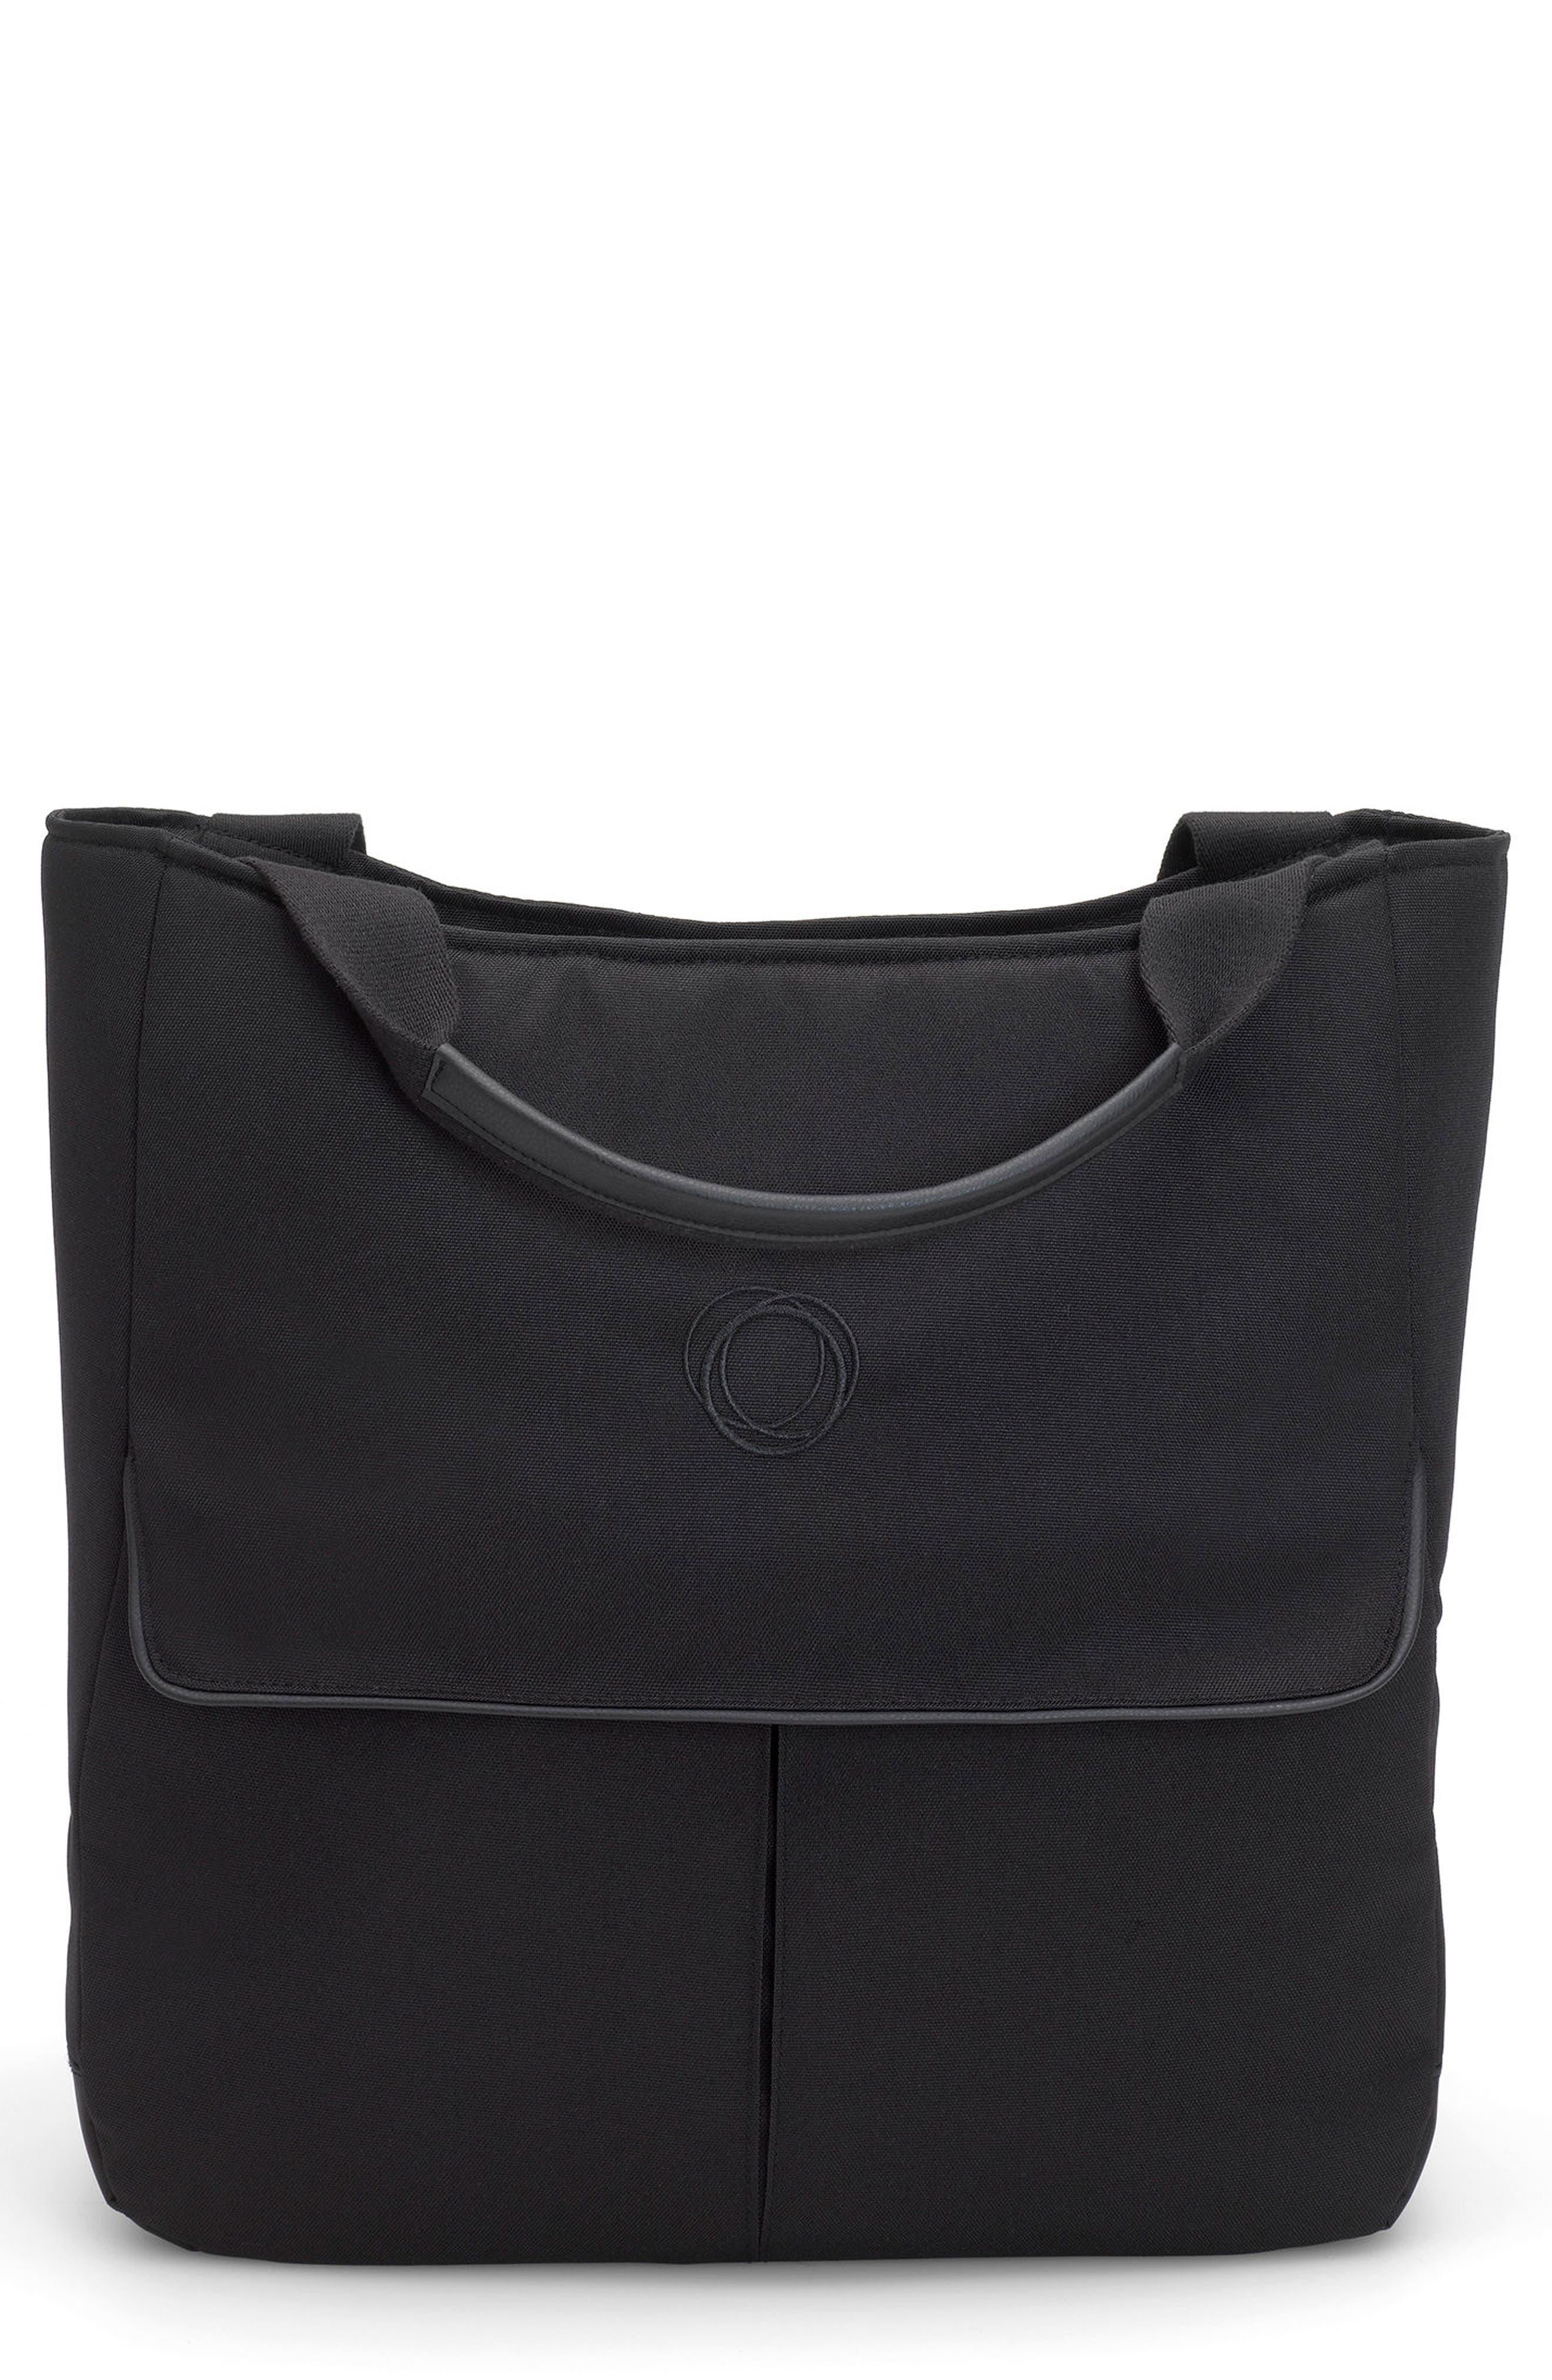 Mammoth Stroller Organizer Bag,                             Main thumbnail 1, color,                             Black